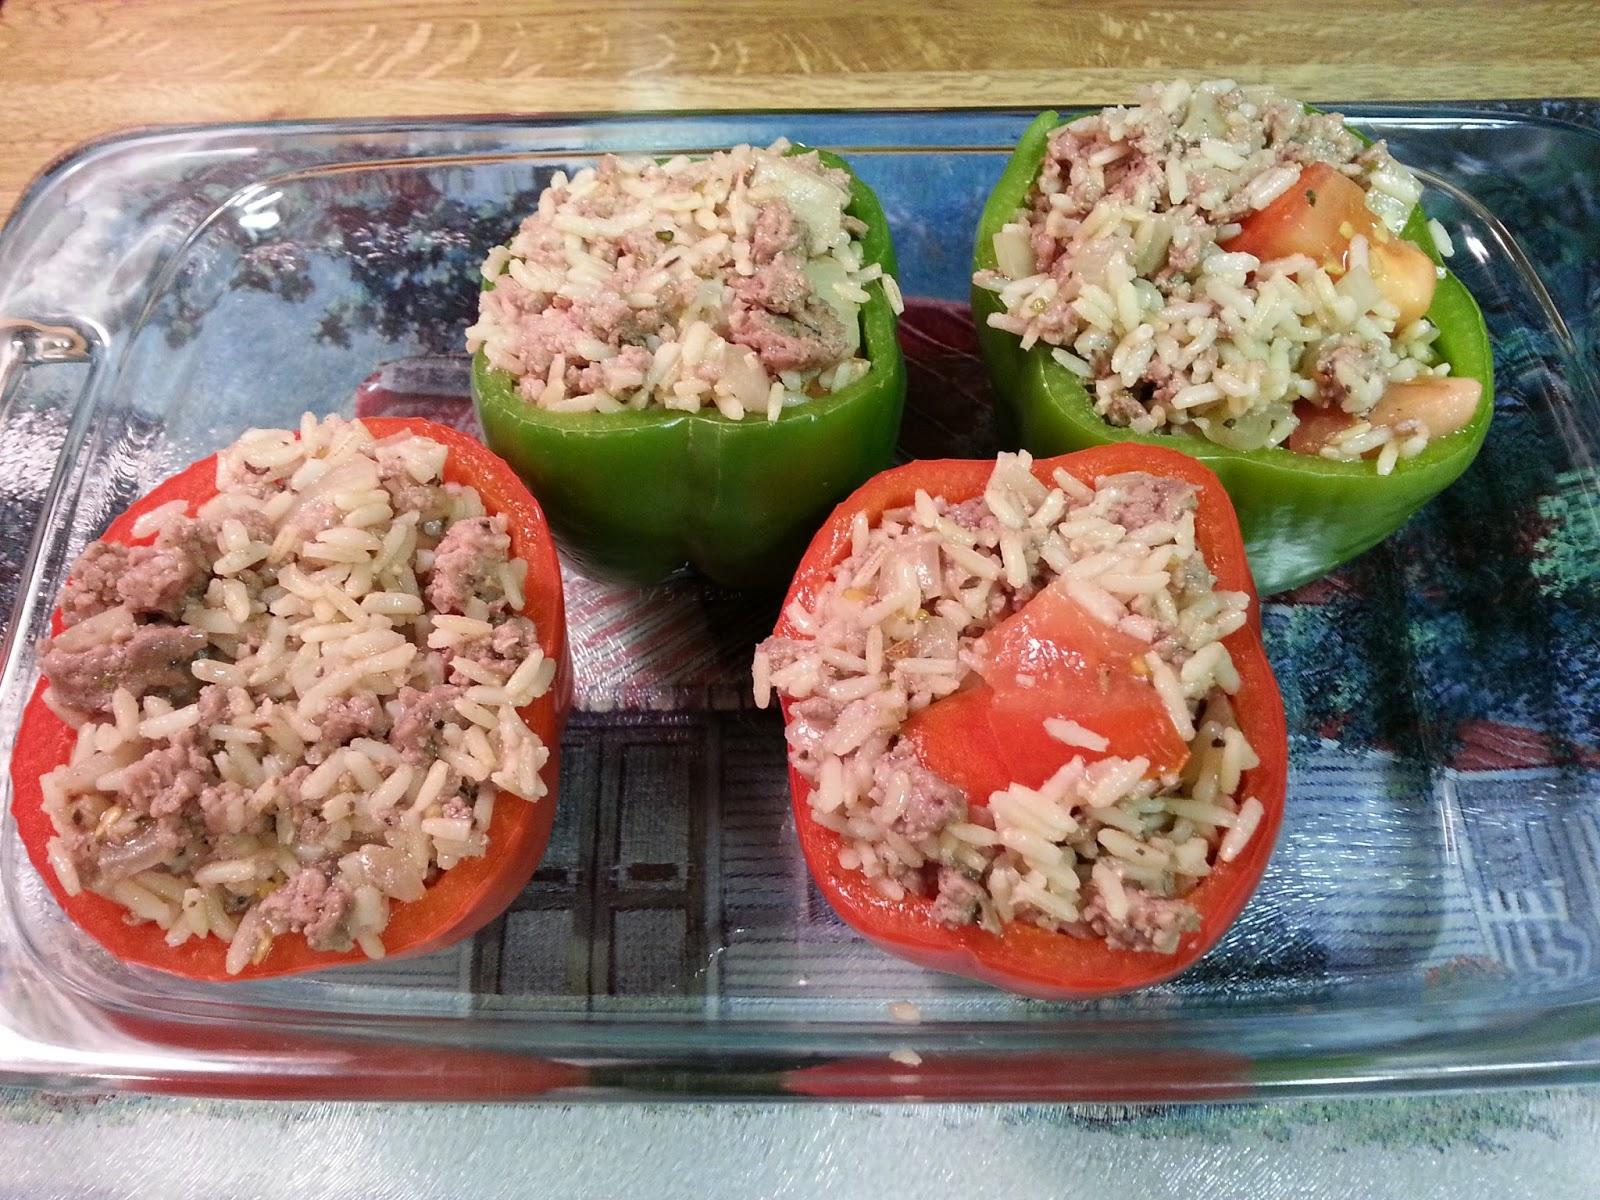 Original Recipe: Dads Stuffed Bell Peppers